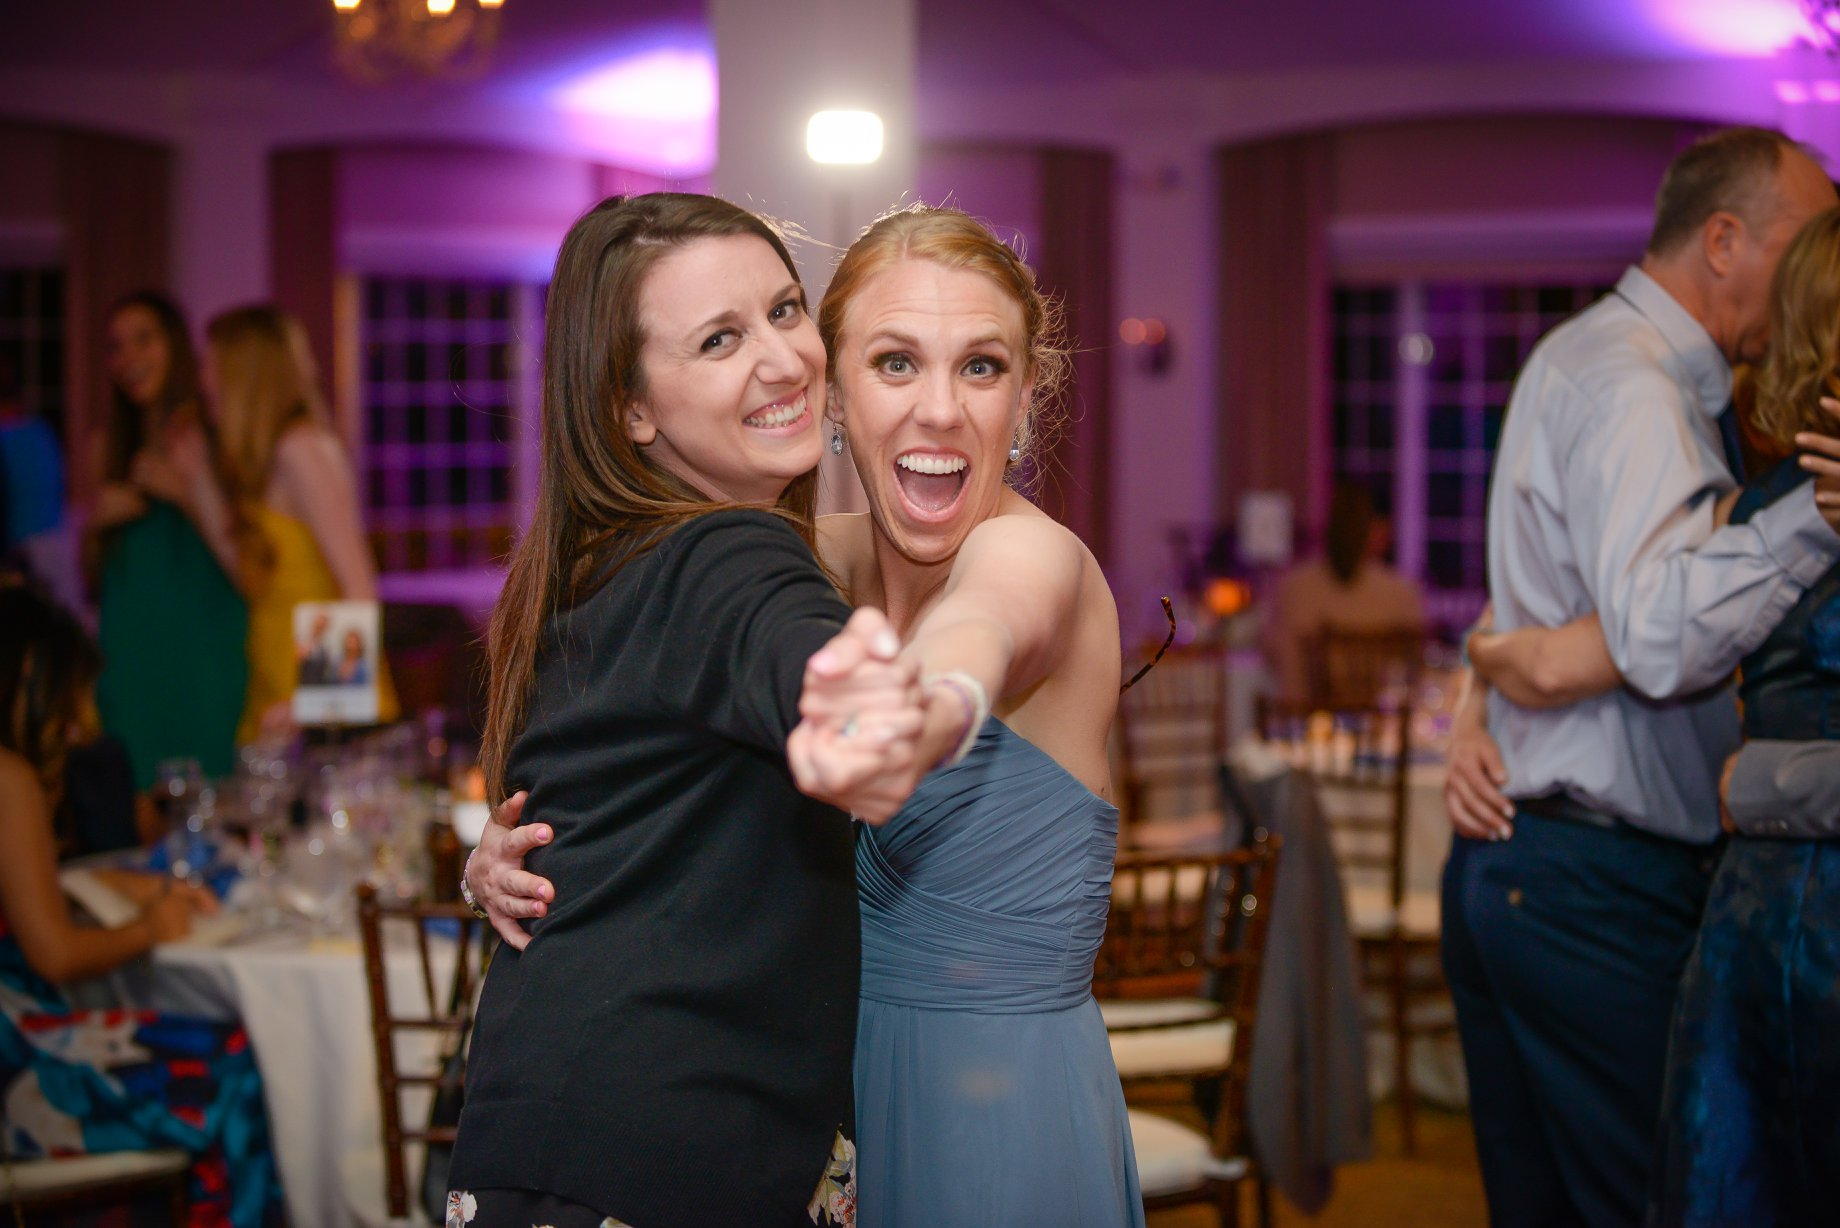 djkanoya_pontewinery-wedding-johnston-dance_girls.jpg